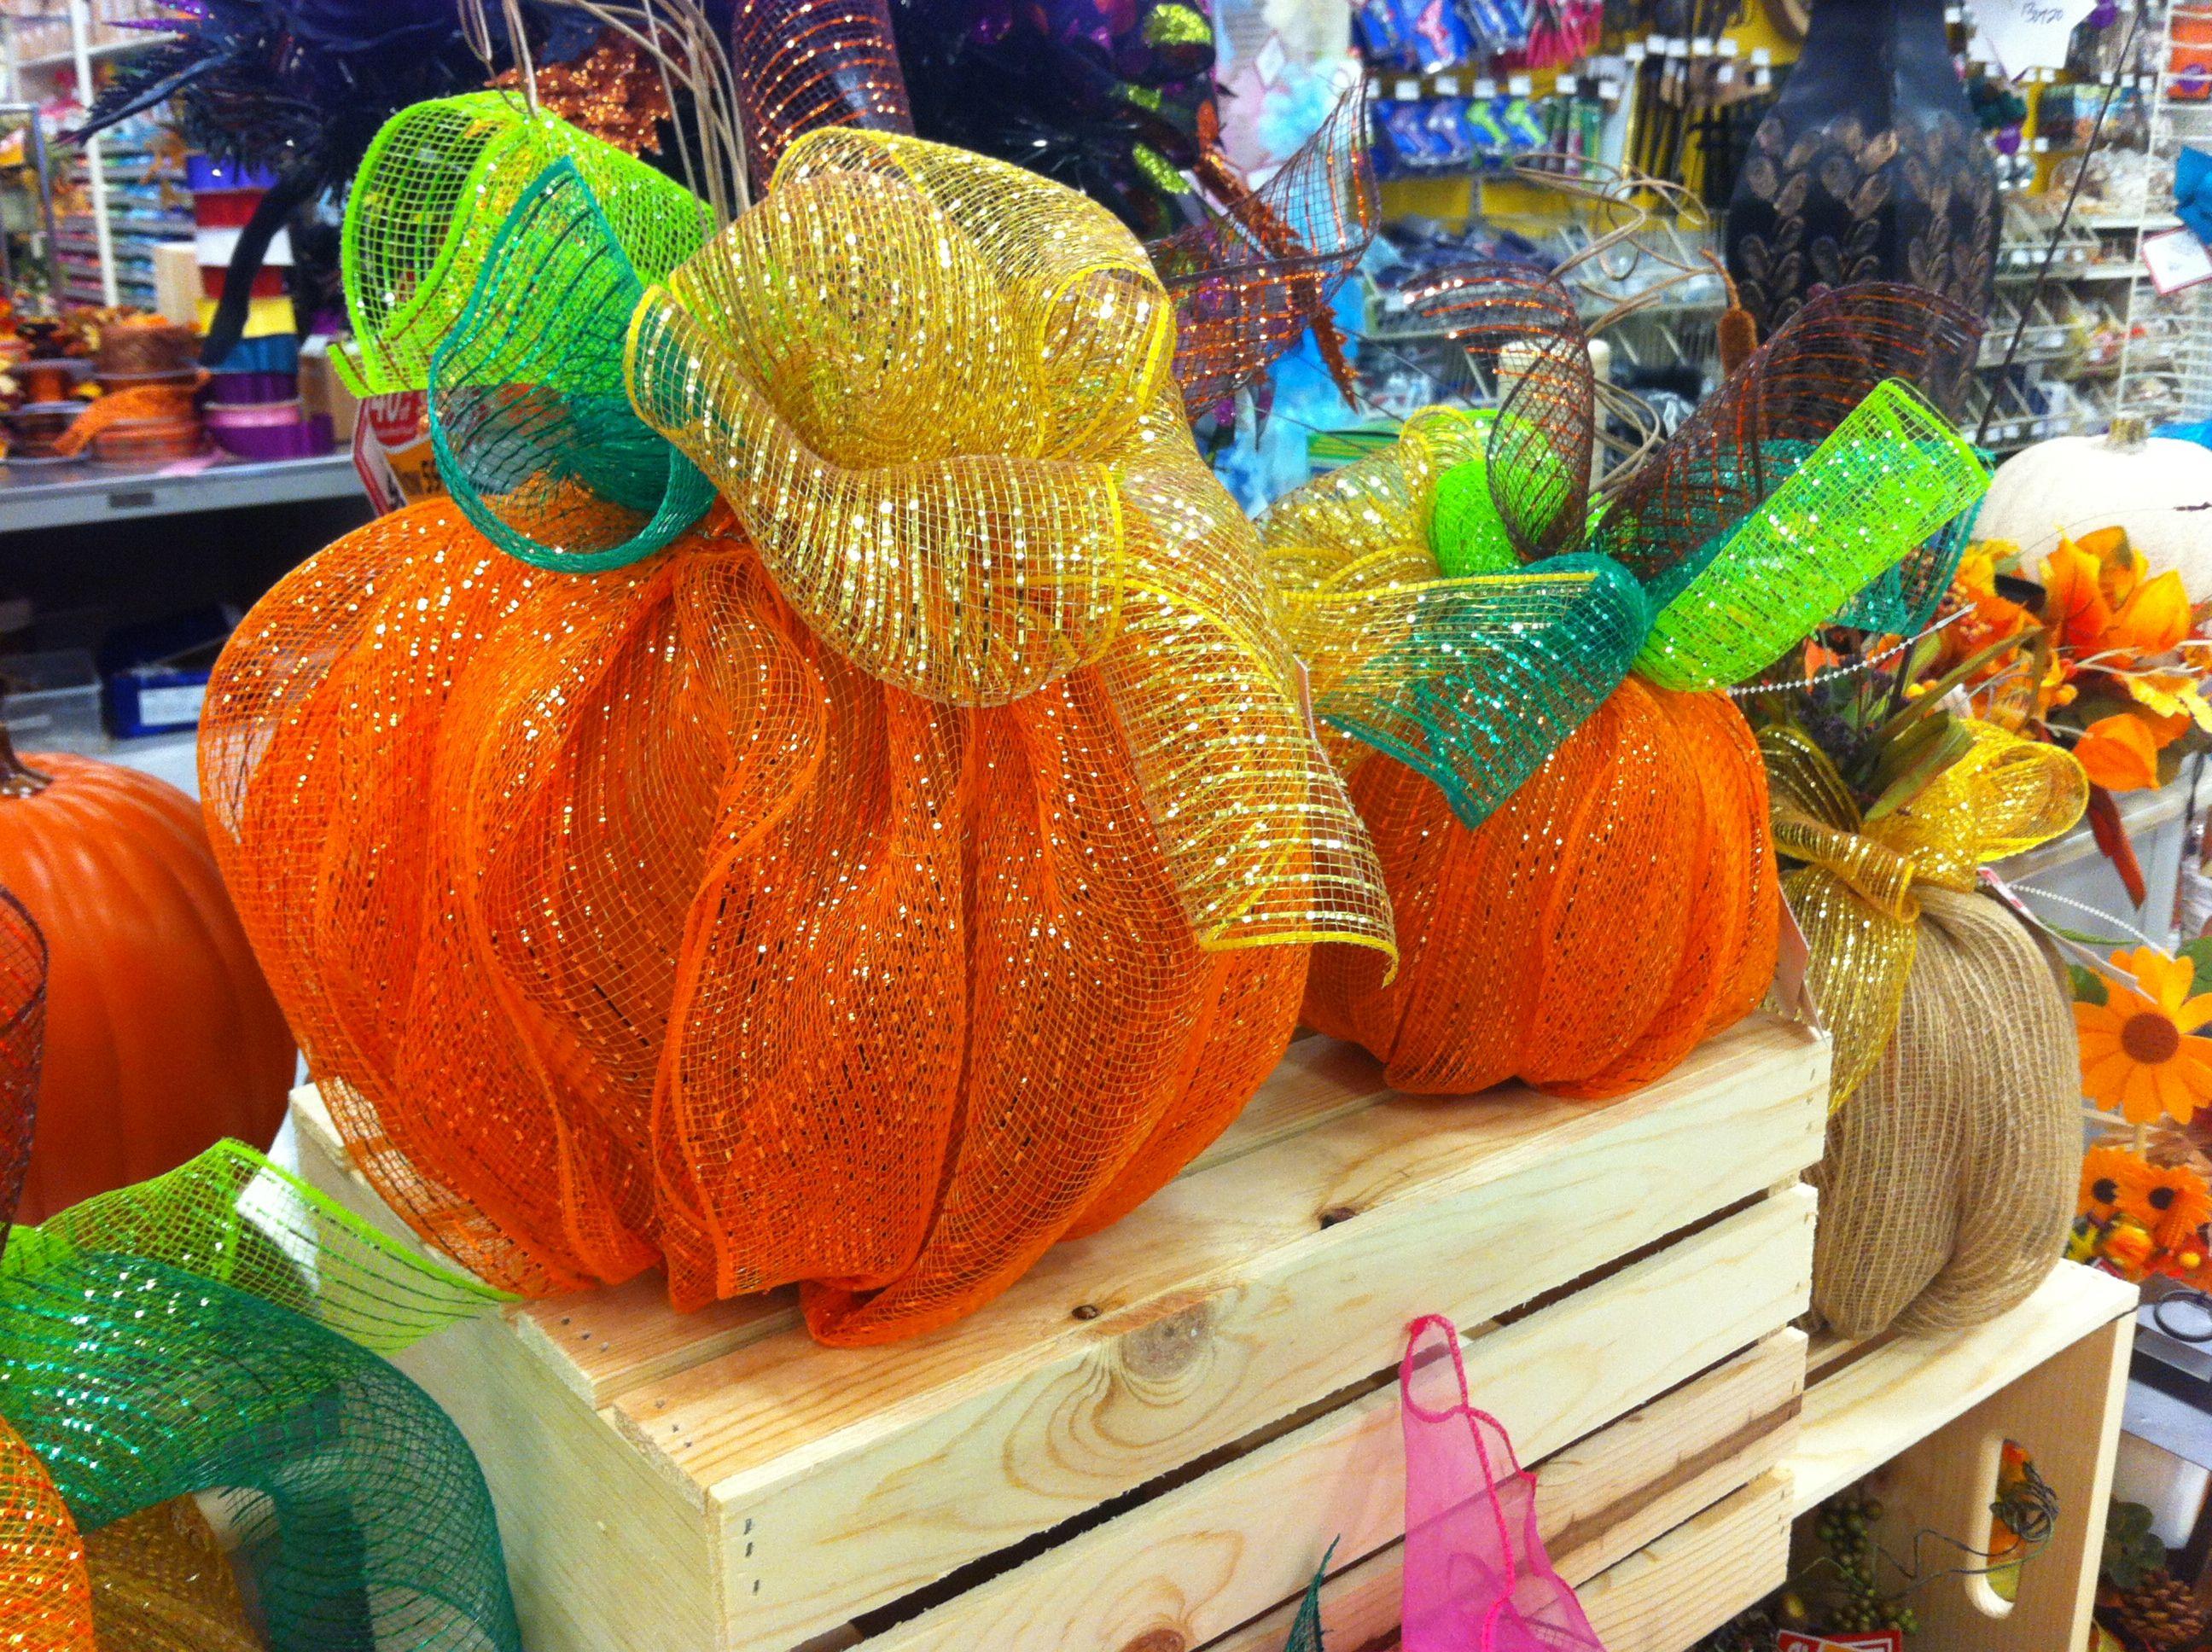 How to store pumpkins - Tulle Pumpkins Plastic Dollar Store Pumpkins Underneath